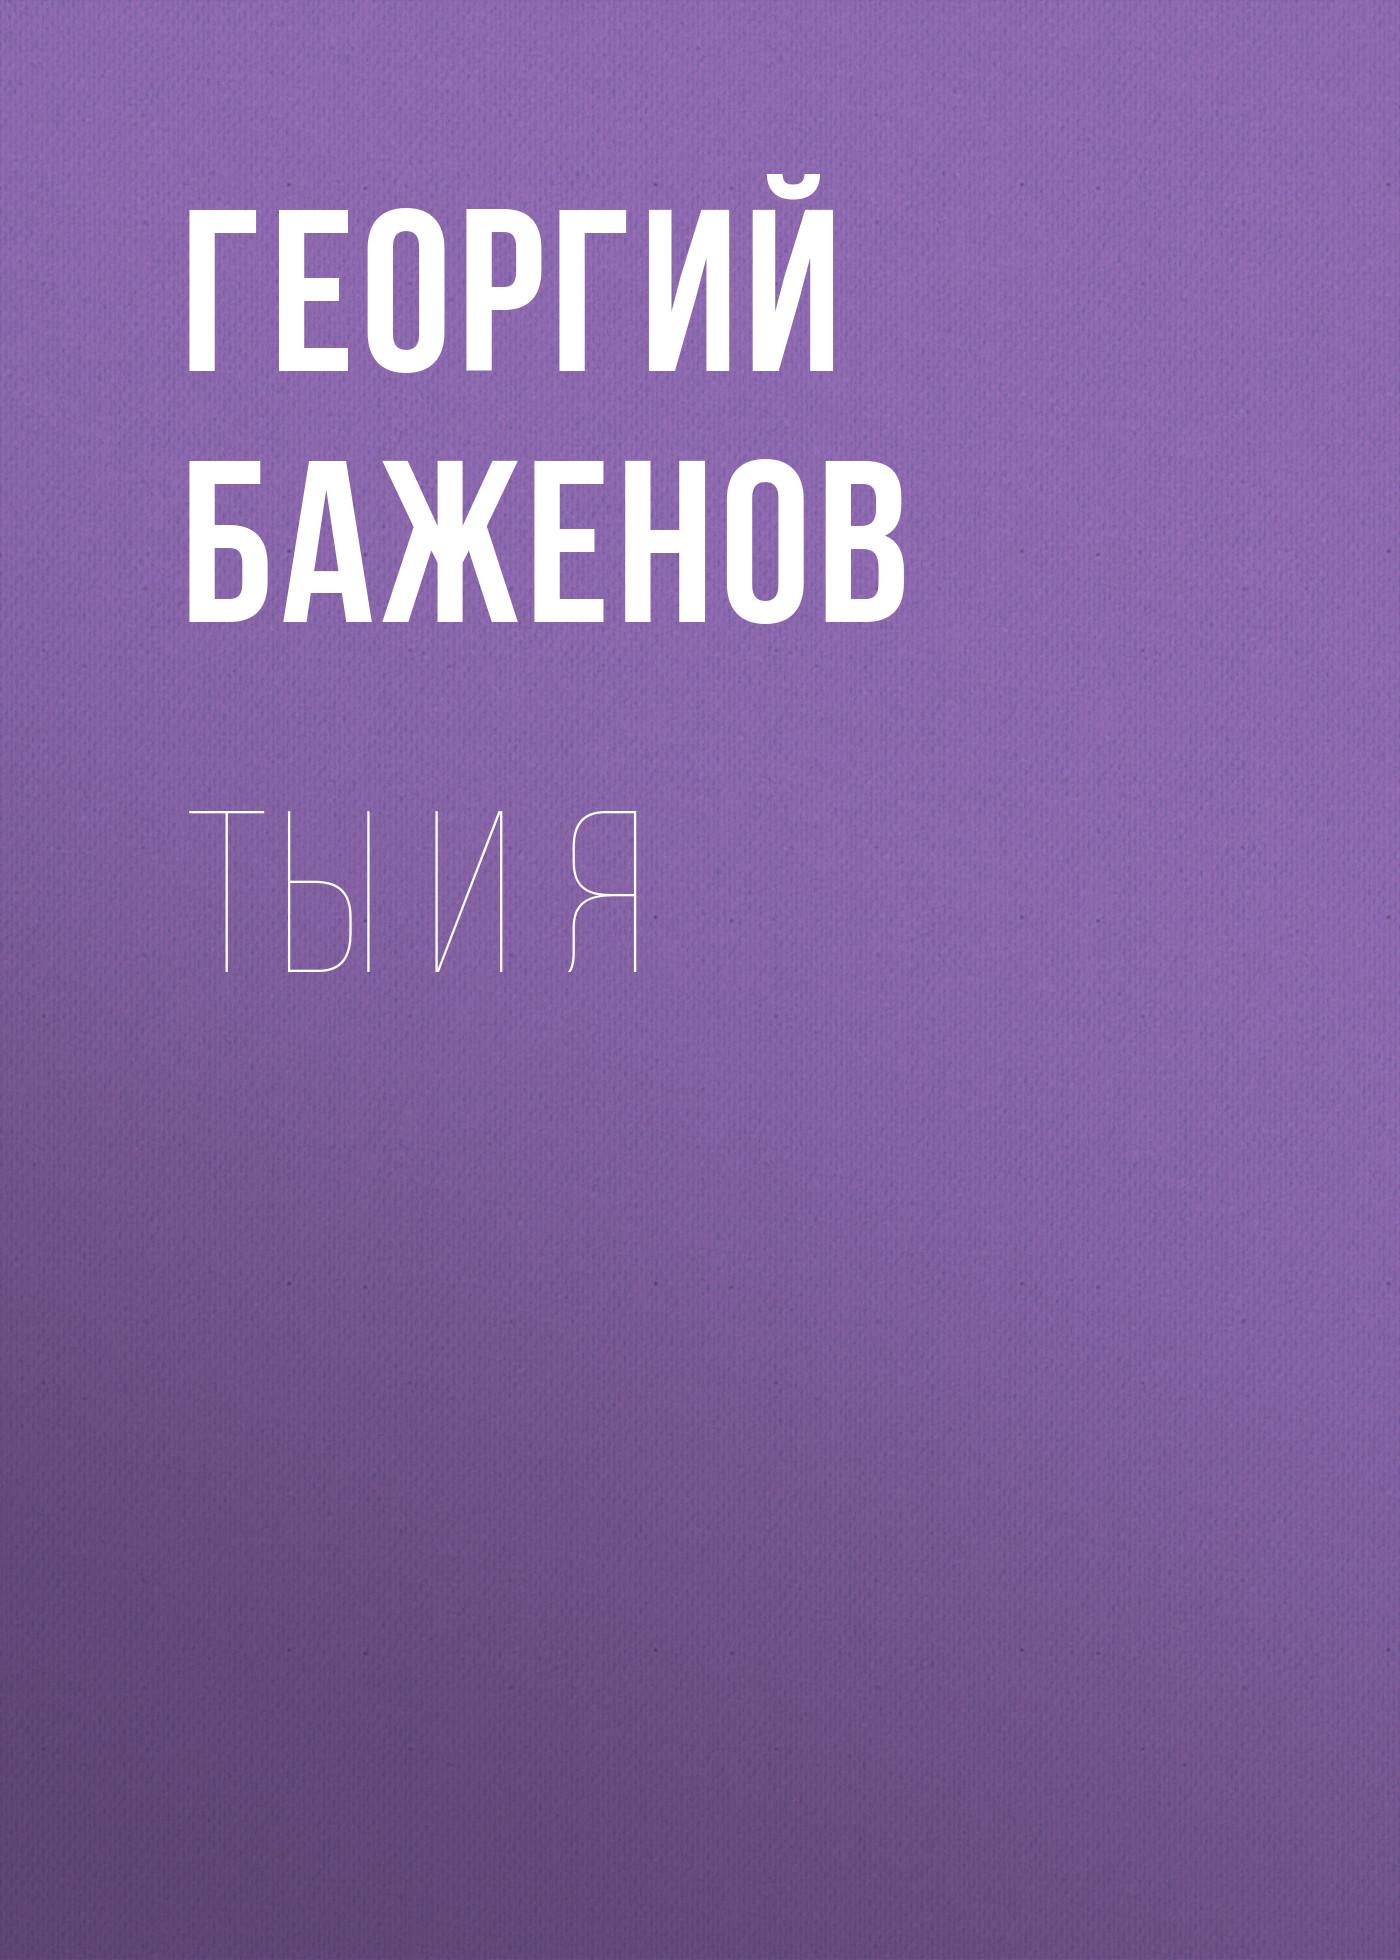 Георгий Баженов Ты и я баженов георгий похищение любви